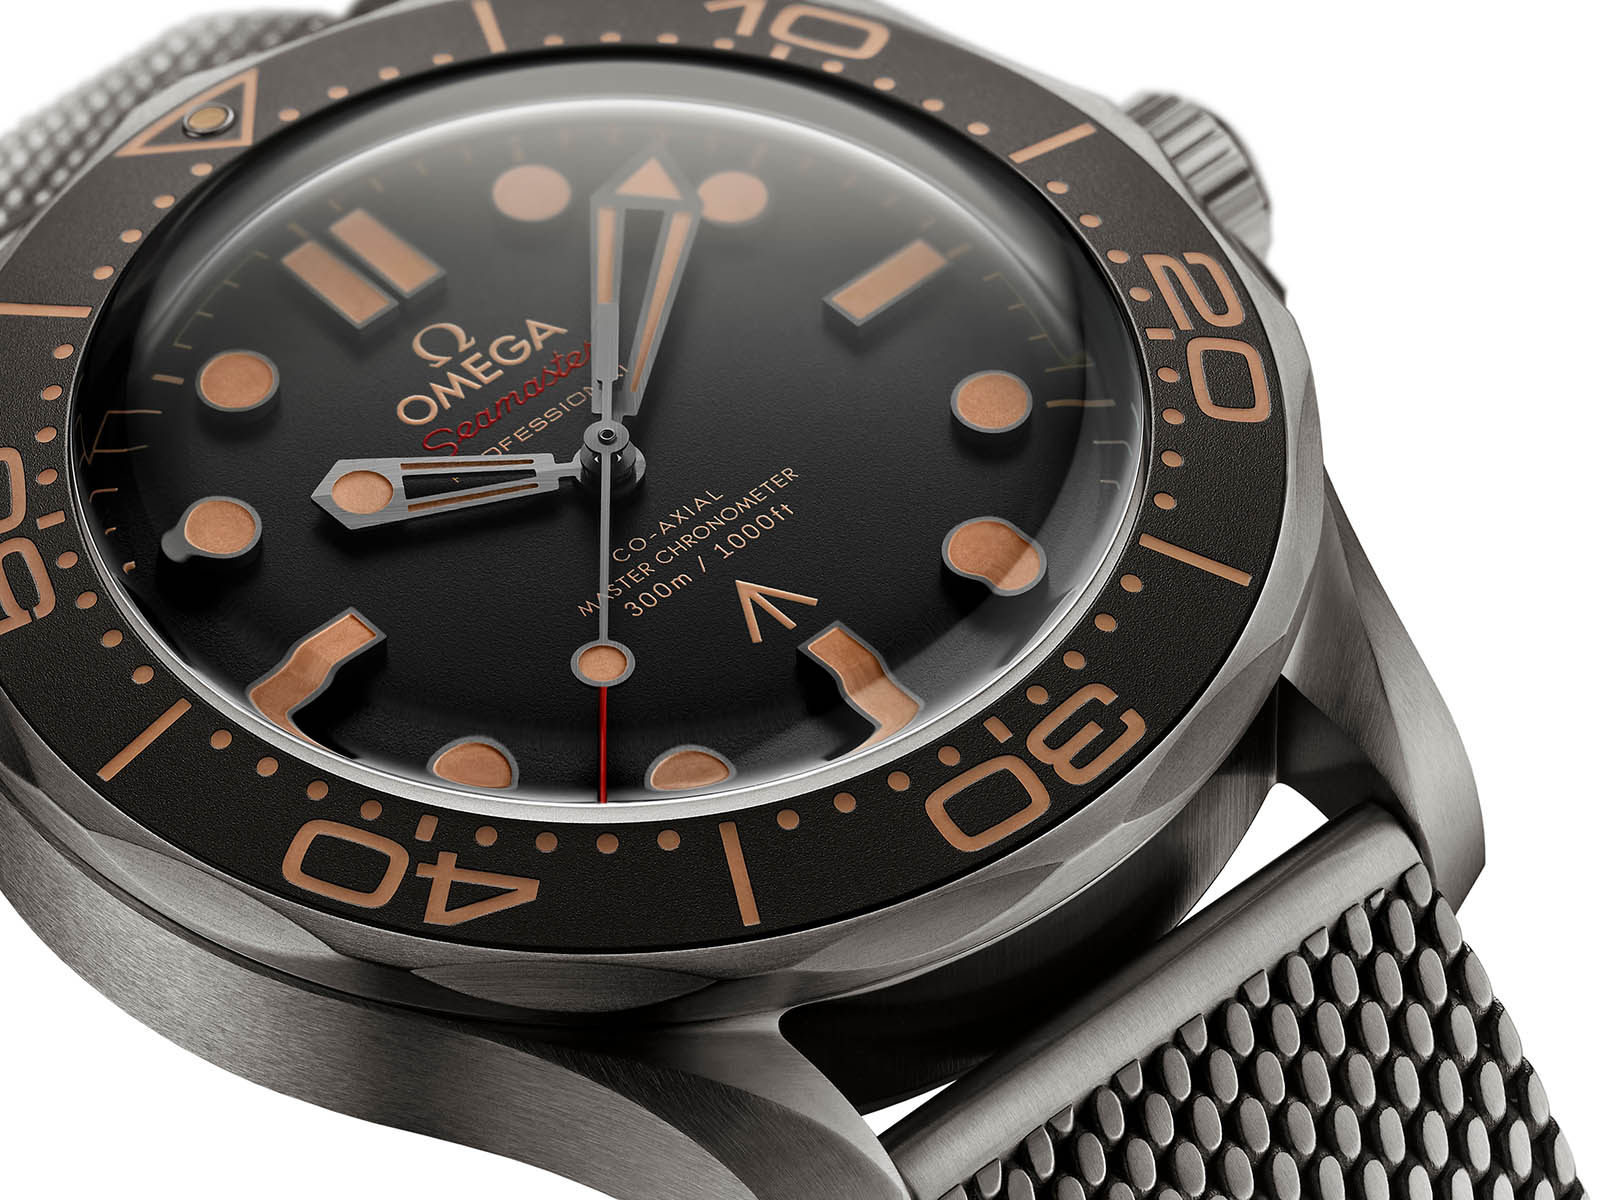 210-90-42-20-01-001-omega-seamaster-diver-300m-007-edition-5.jpg